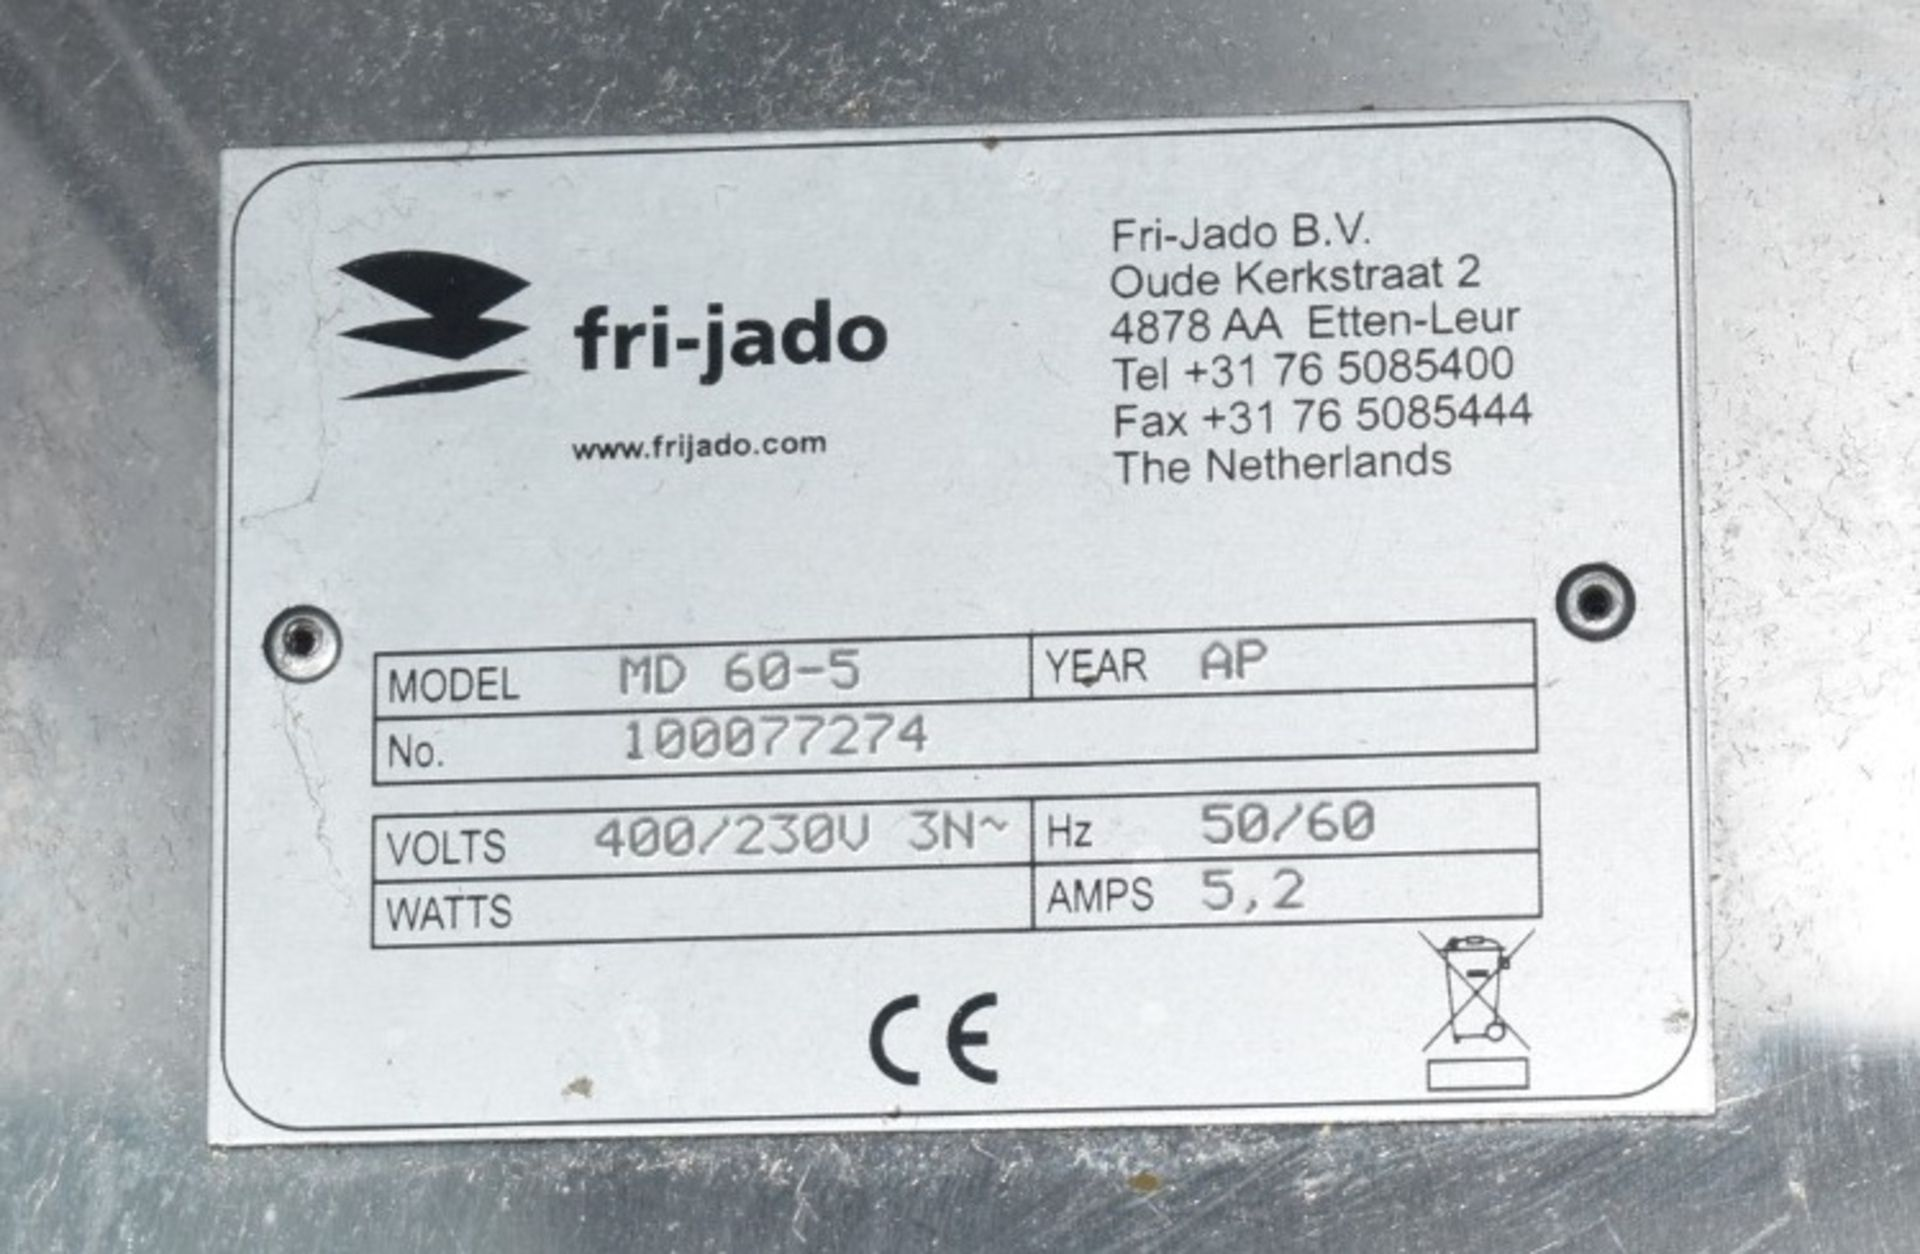 1 x Frijado Multi Deck 60 5 Level Heated Grab and Go Display Warmer - 400v 3 Phase - H197 x W60 x - Image 2 of 3